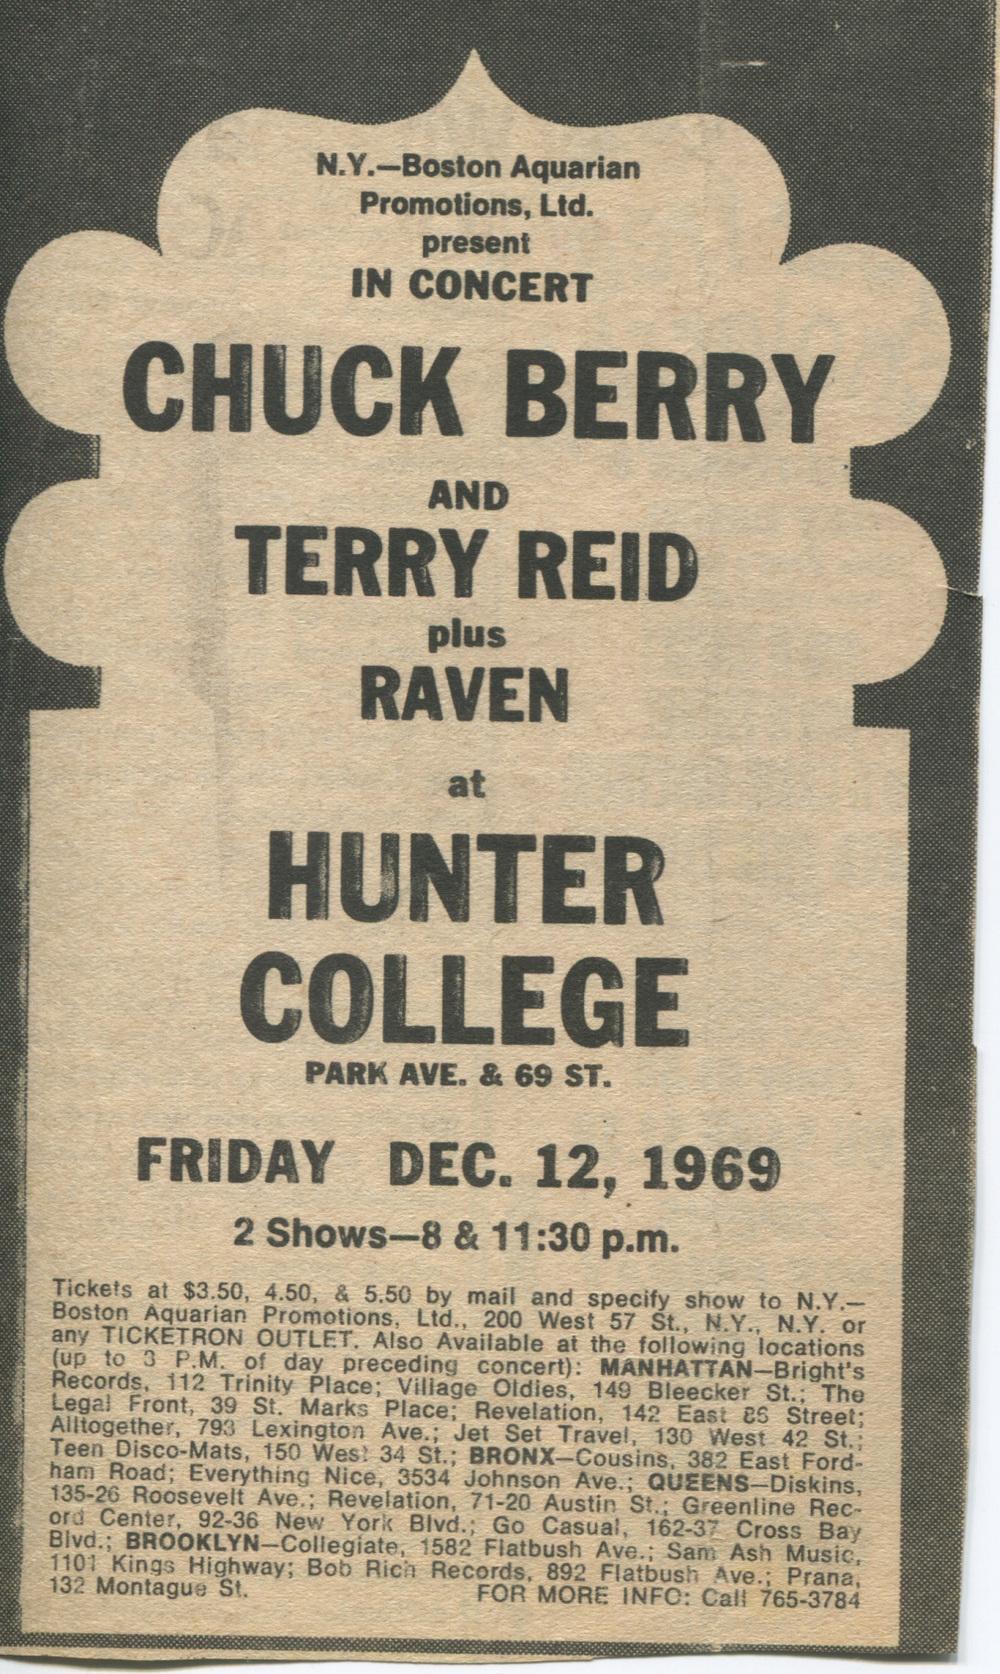 Chuck-Berry-and-Terry-Reid-Concert-Flyer.jpg